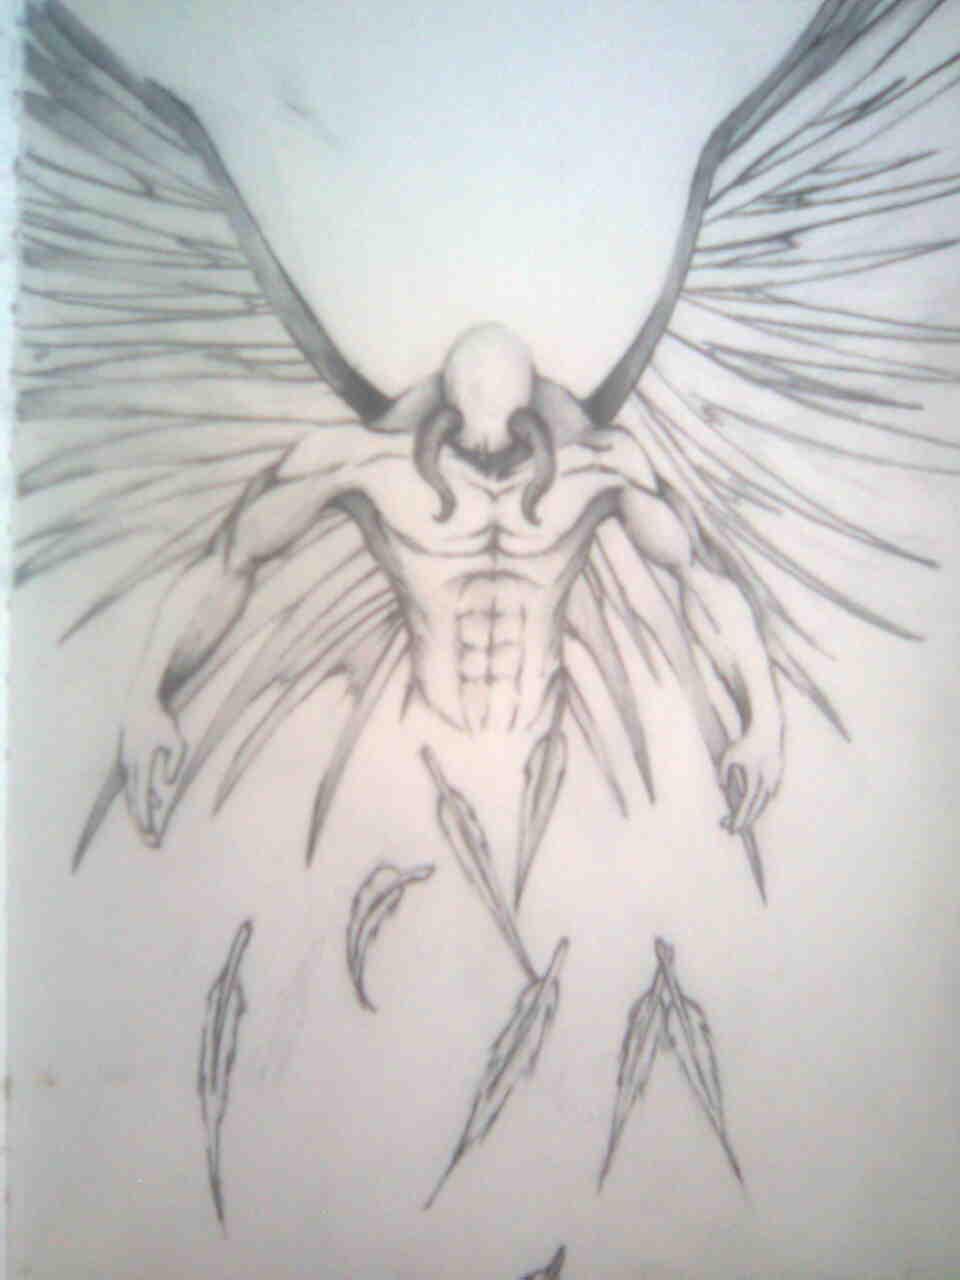 30 fallen angel tattoo ideas fallen angel tattoo design sample altavistaventures Choice Image